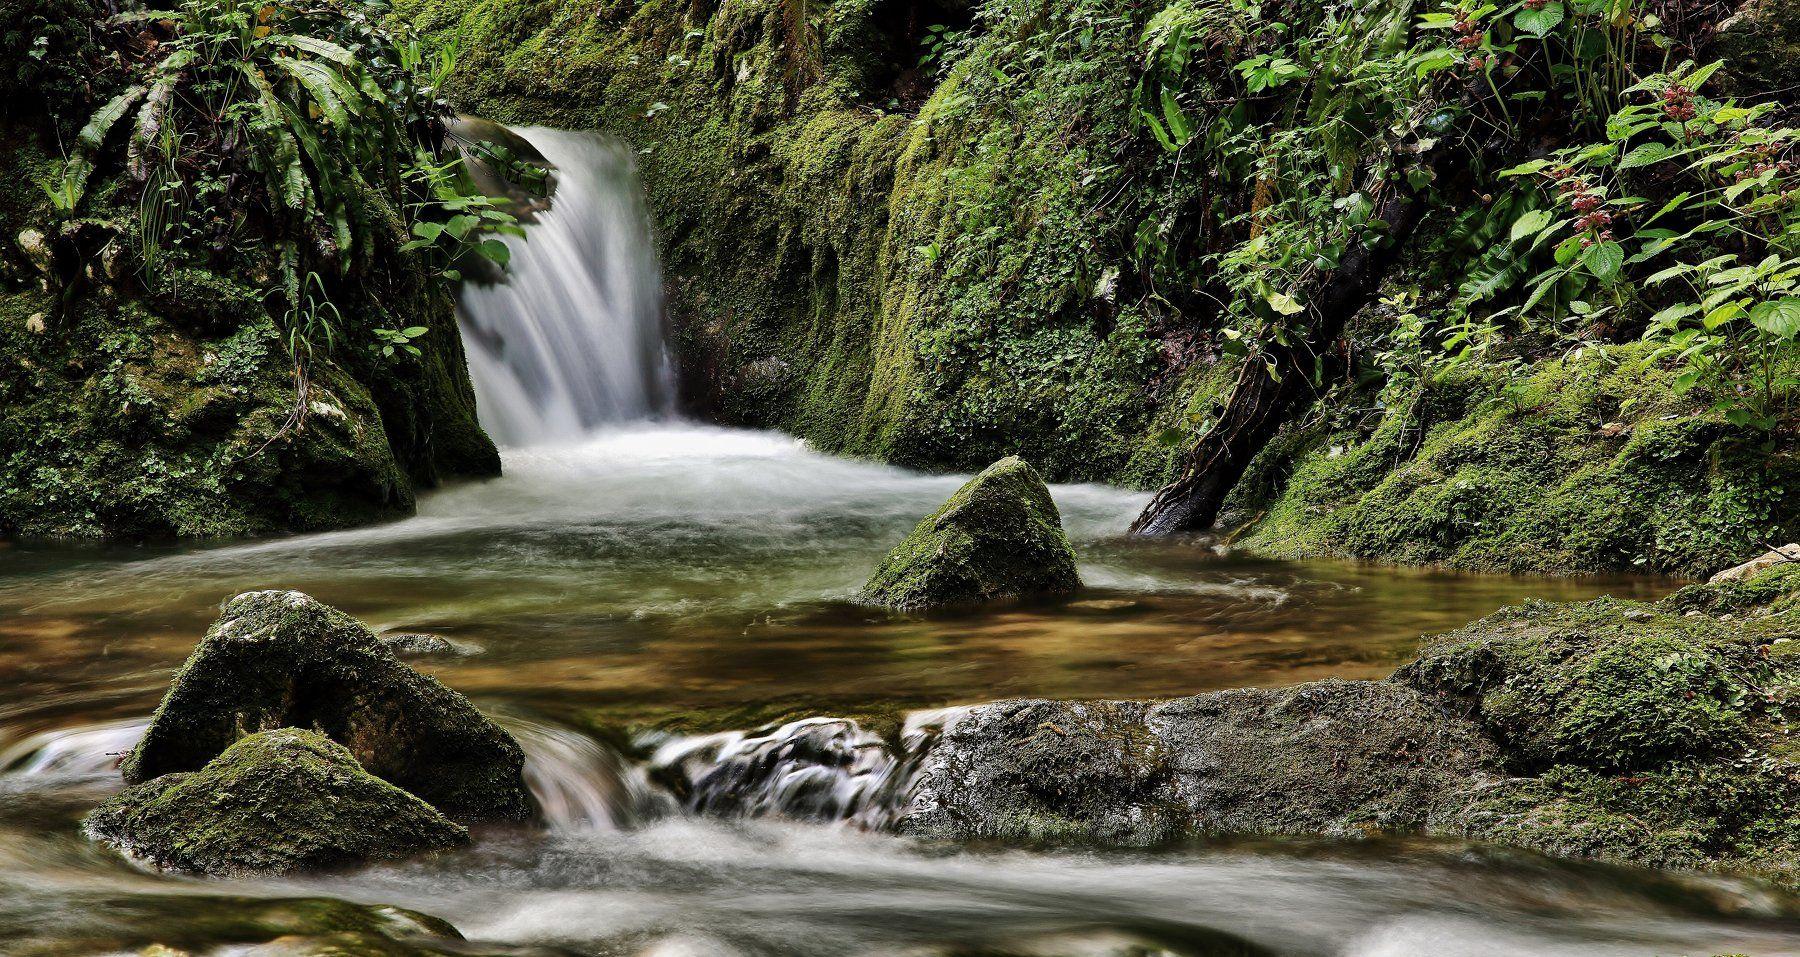 natura,torrente,acqua,muschio,vegetazione, paologr63